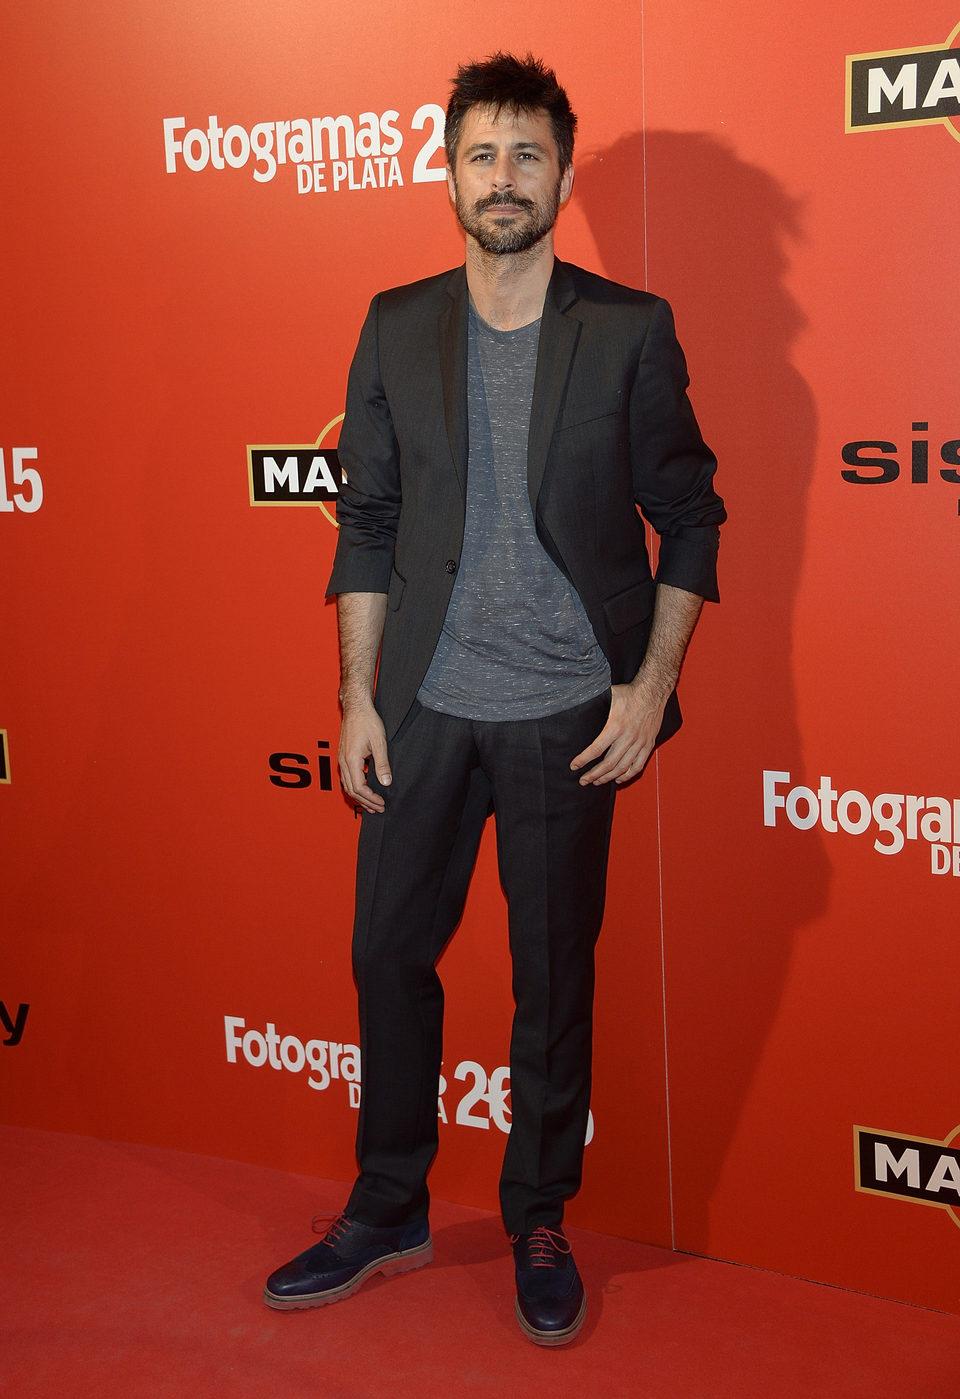 Hugo Silva en la alfombra roja de los Fotogramas de Plata 2015